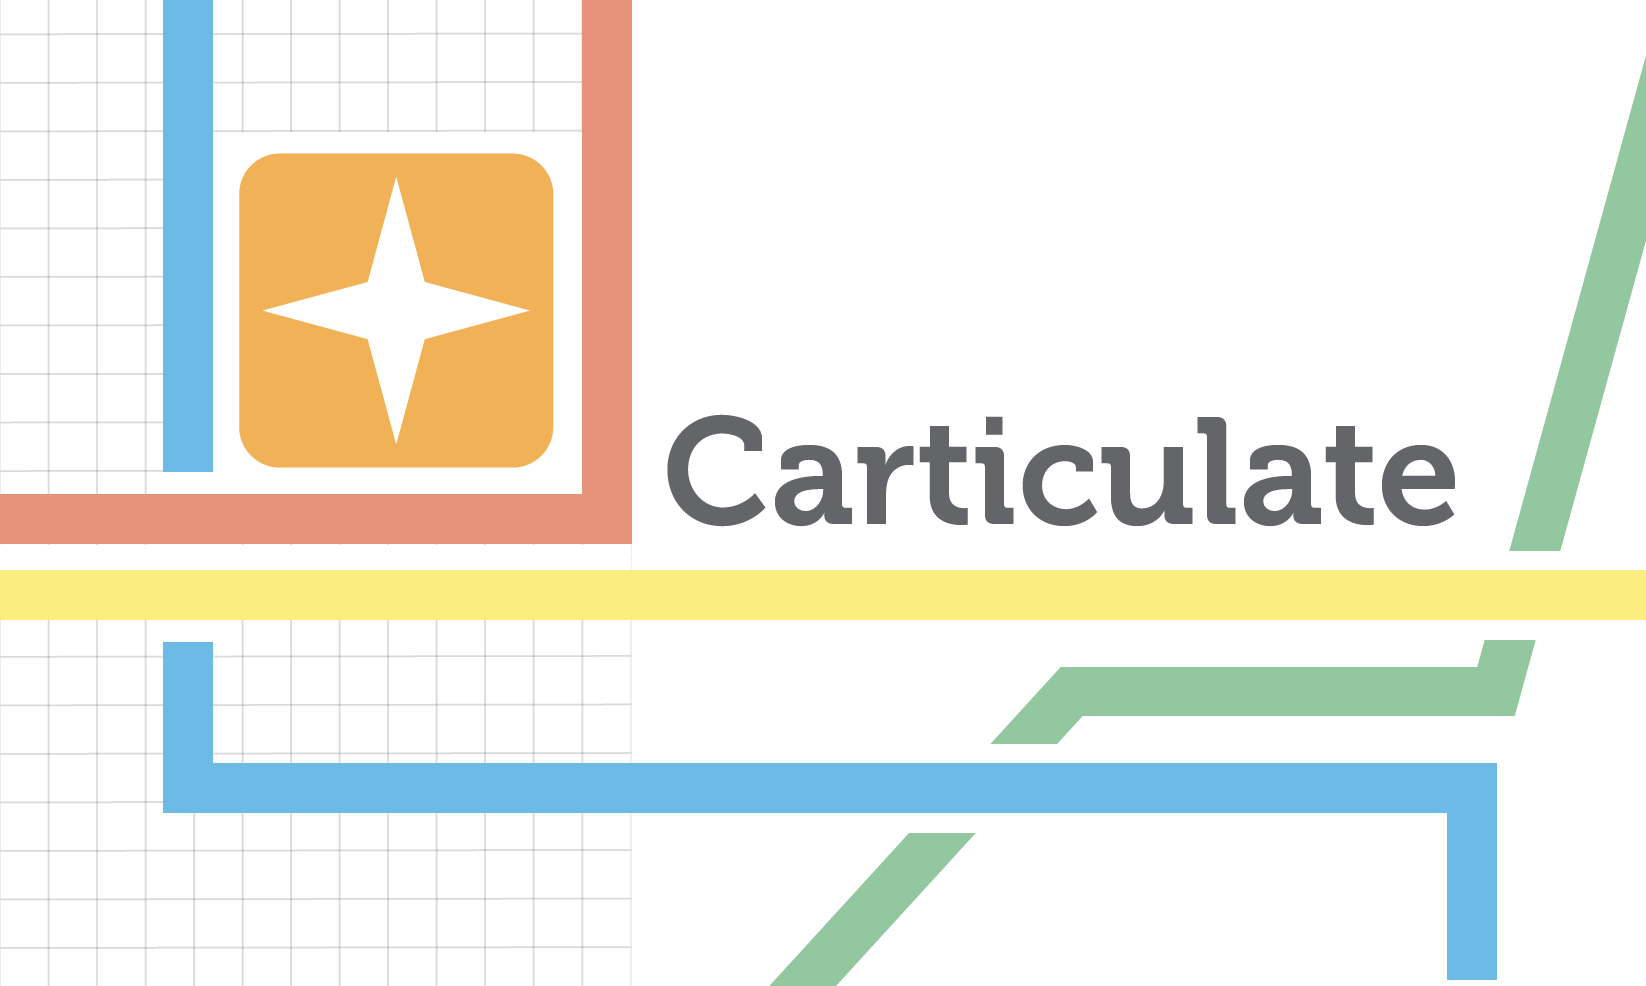 Carticulate Maps LLC